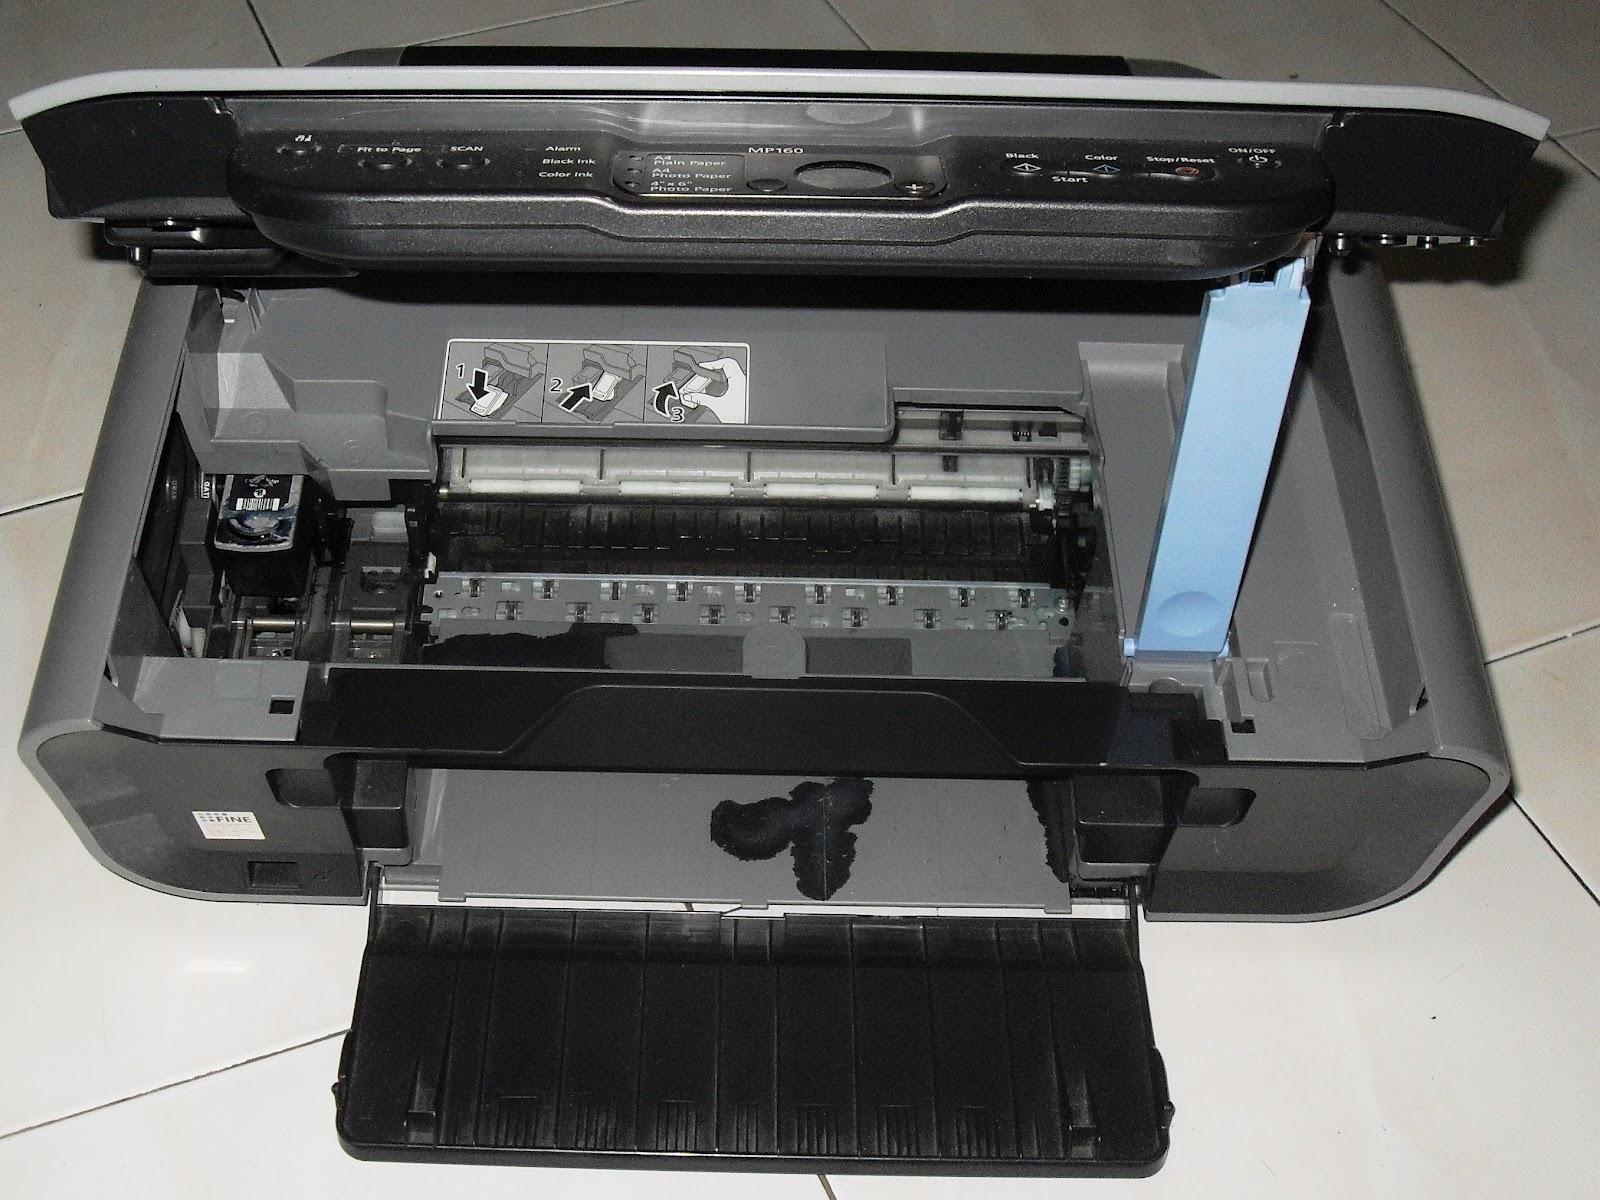 telecharger driver imprimante canon pixma mp160 freeleaders. Black Bedroom Furniture Sets. Home Design Ideas